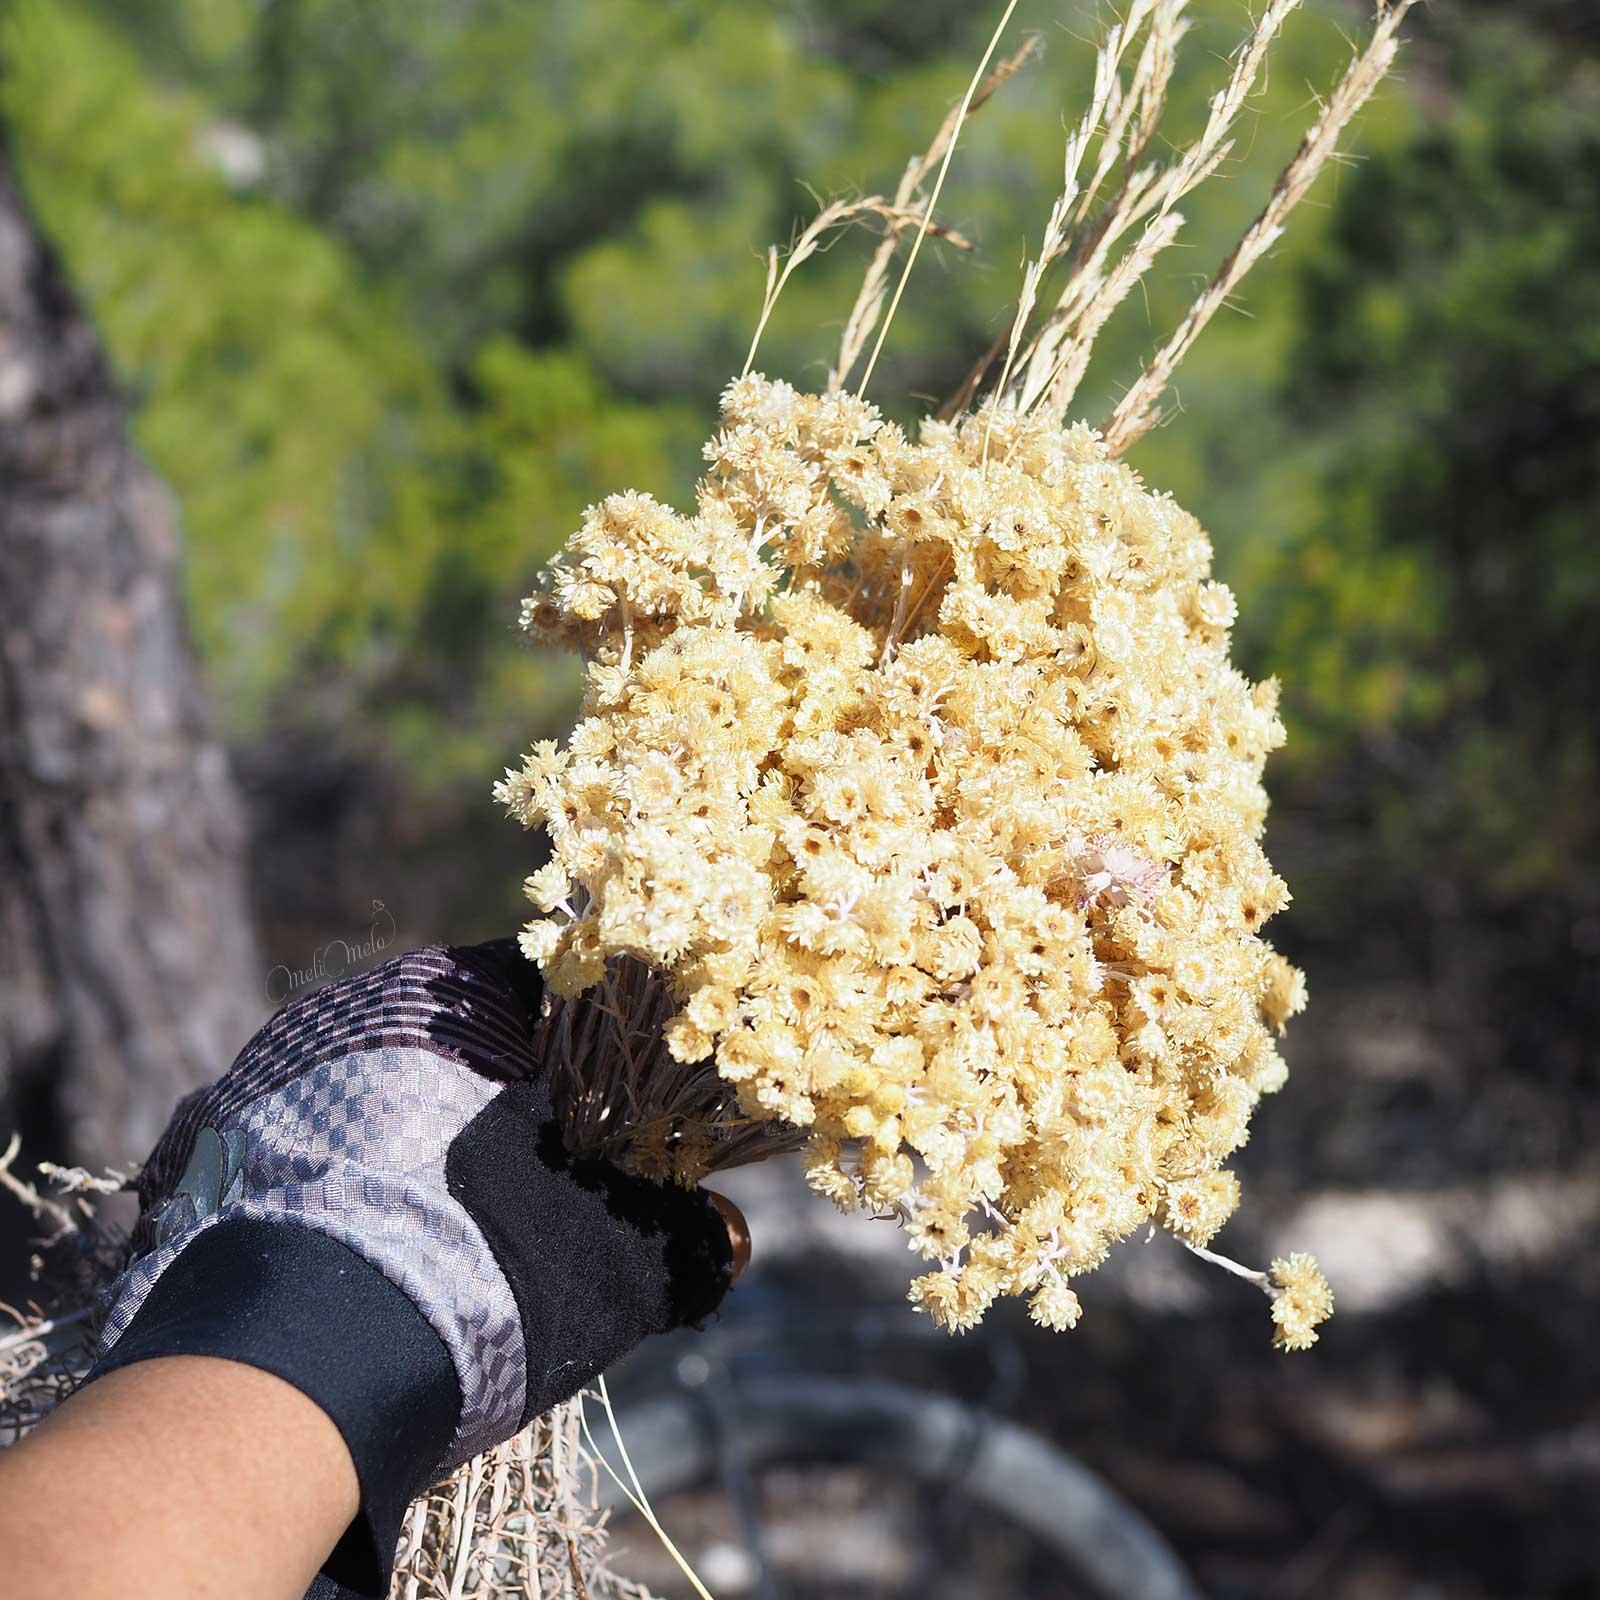 helichrysum-stoechas-moench-siempreviva-montes-torozos-fleurs-immortelle-yoniquenews-laboutiquedemelimelo